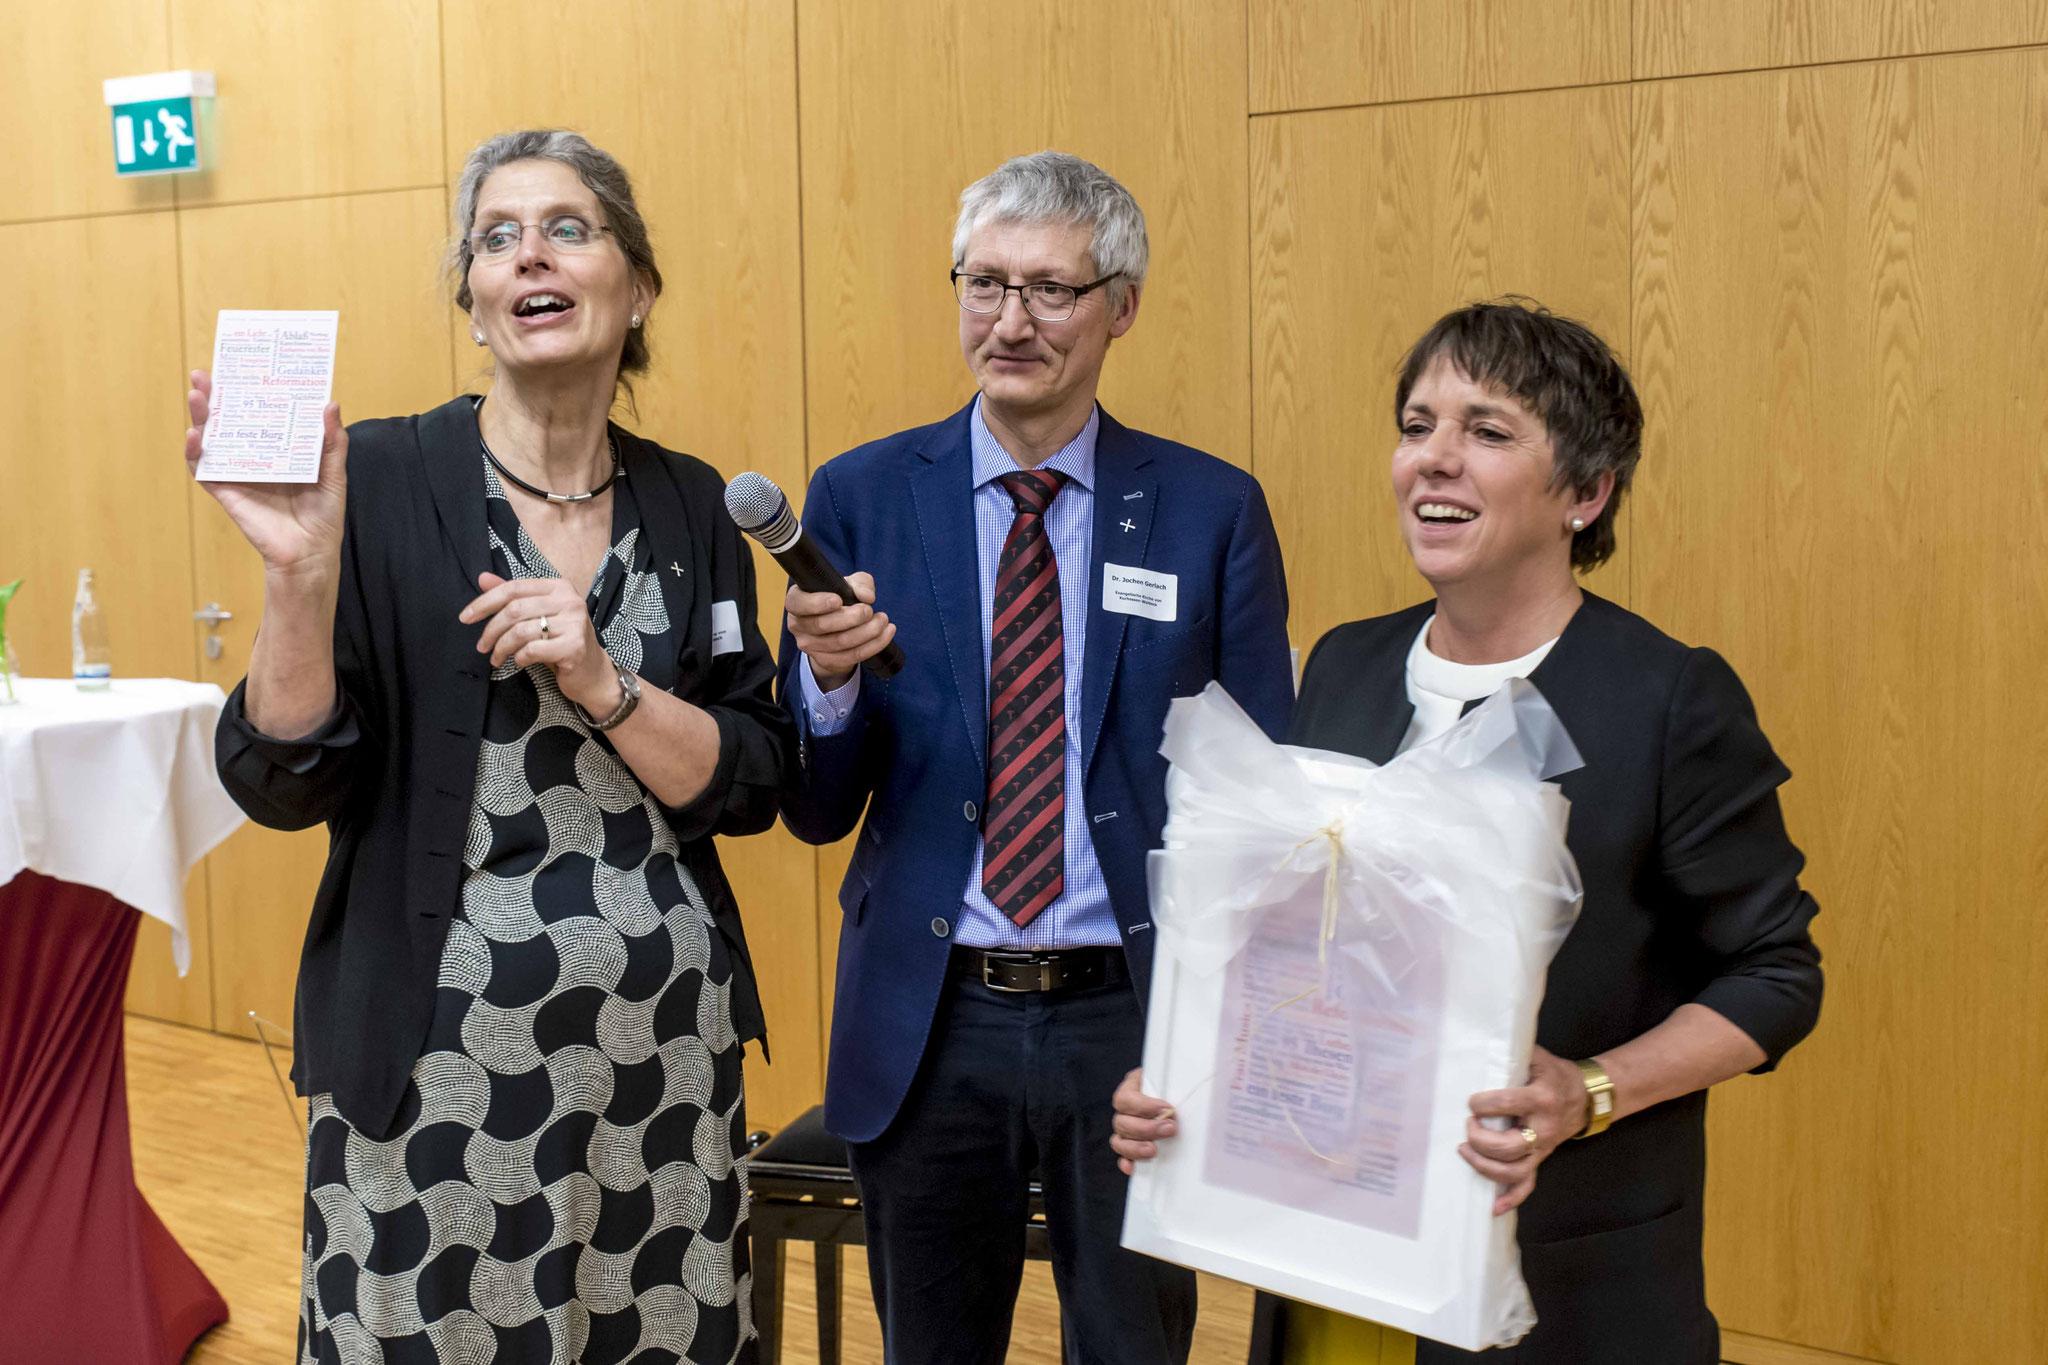 Ute Göpel, Jochen Gerlach und Margot Käßmann